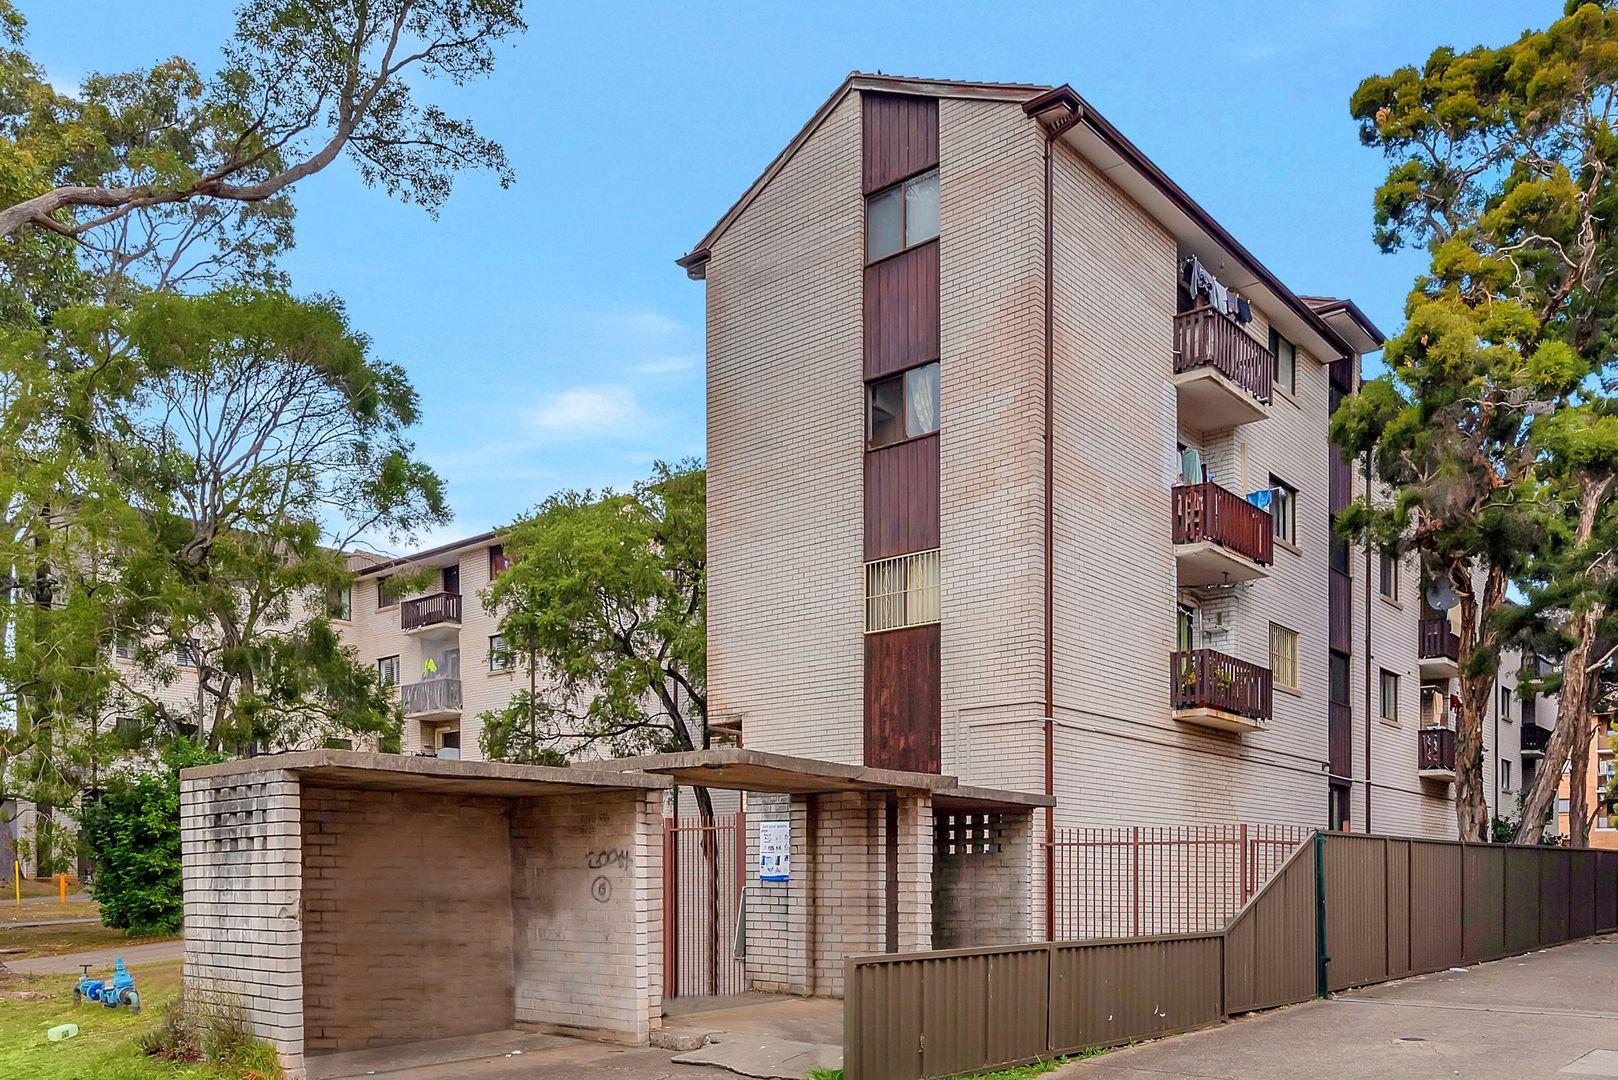 22/144 John St, Cabramatta NSW 2166, Image 1